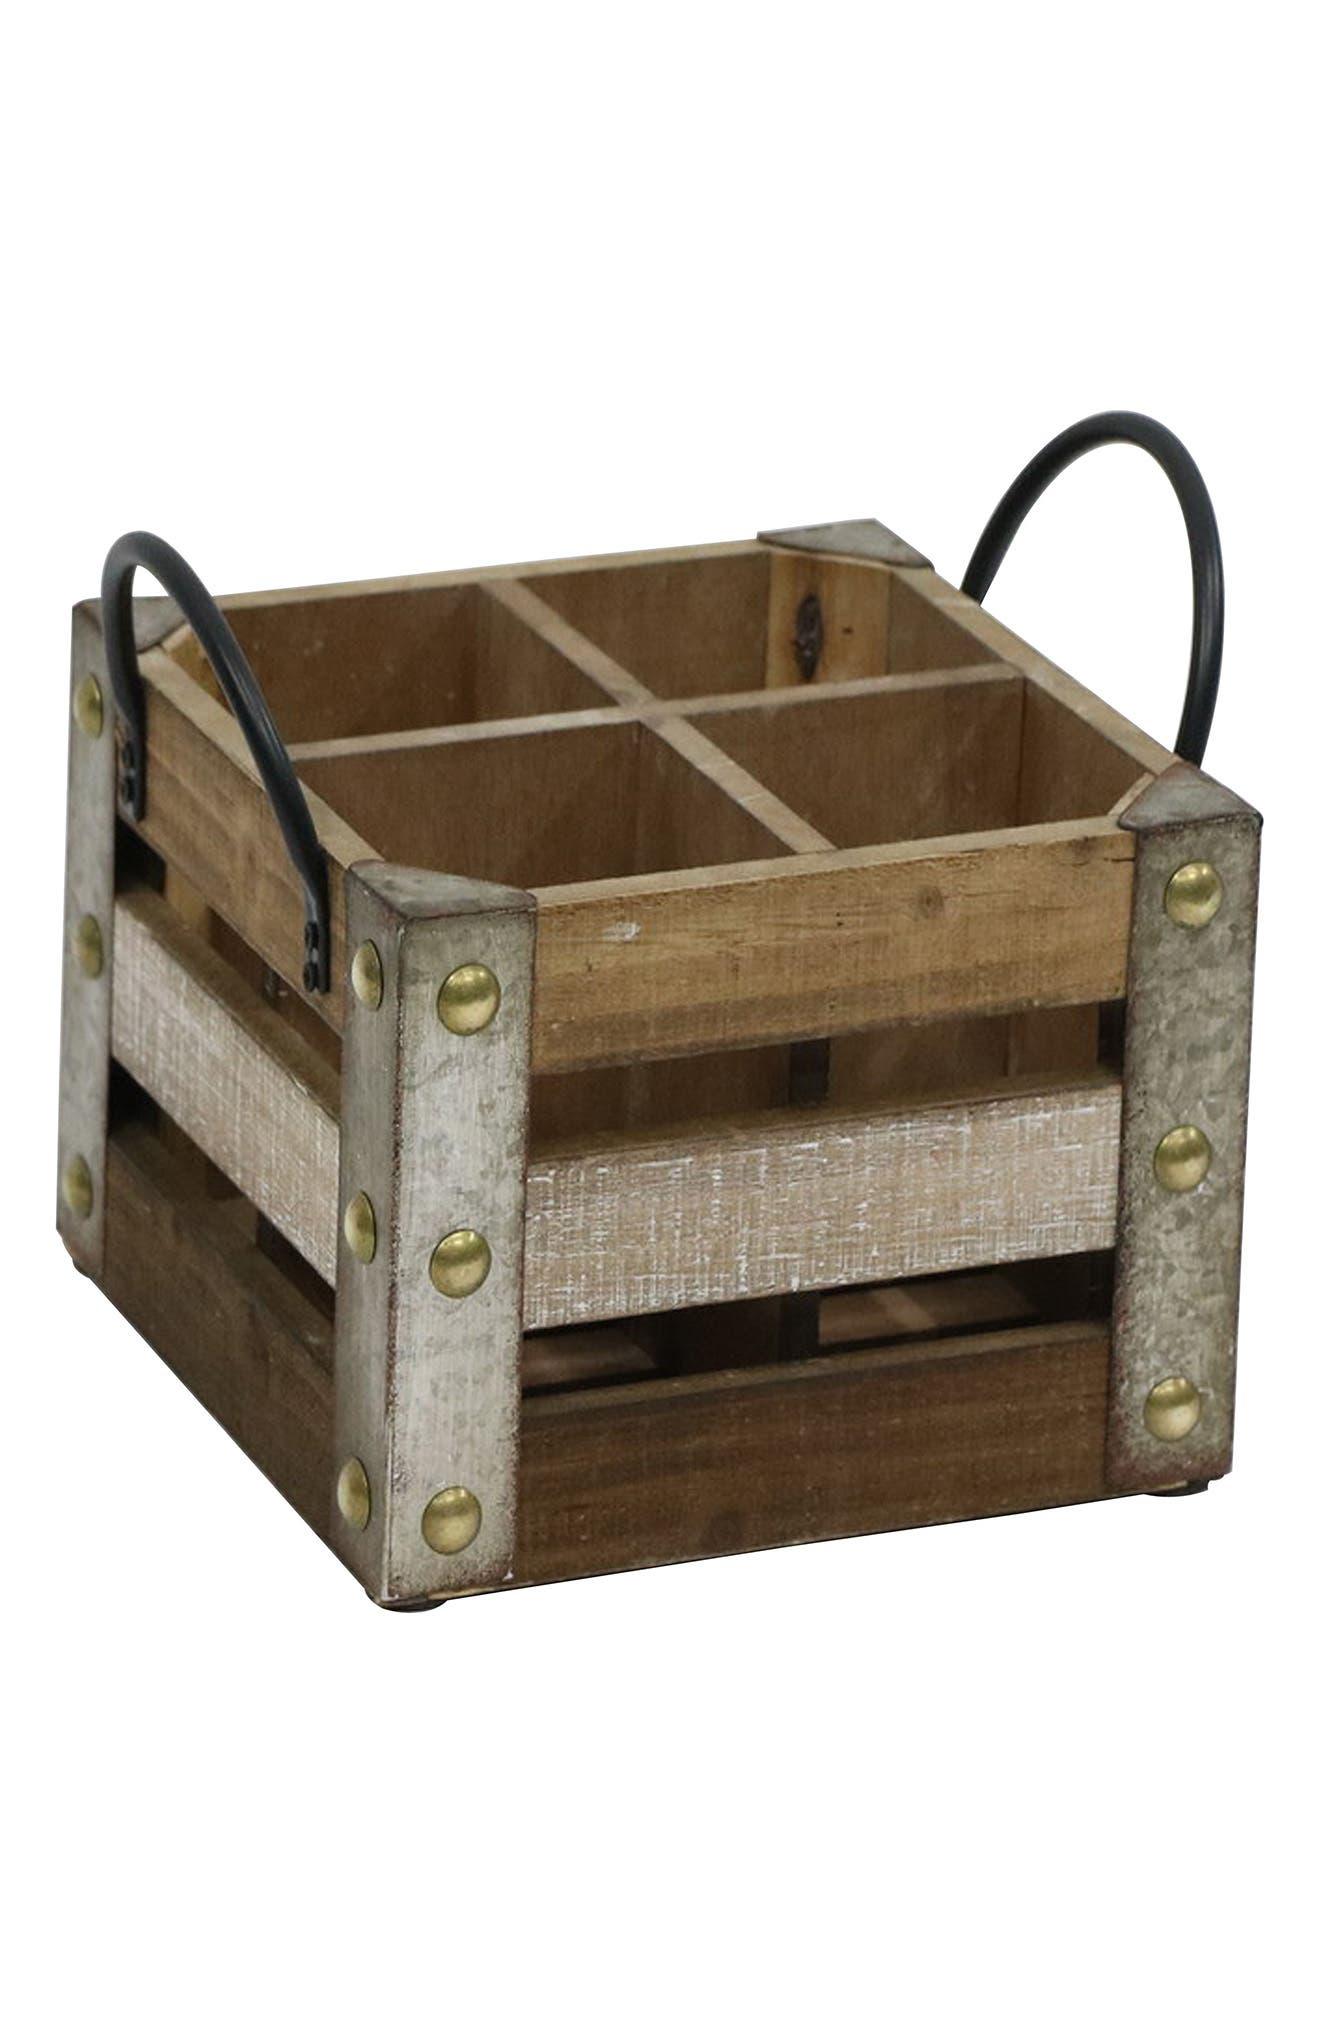 Alternate Image 1 Selected - Crystal Art Gallery Wooden Wine Crate